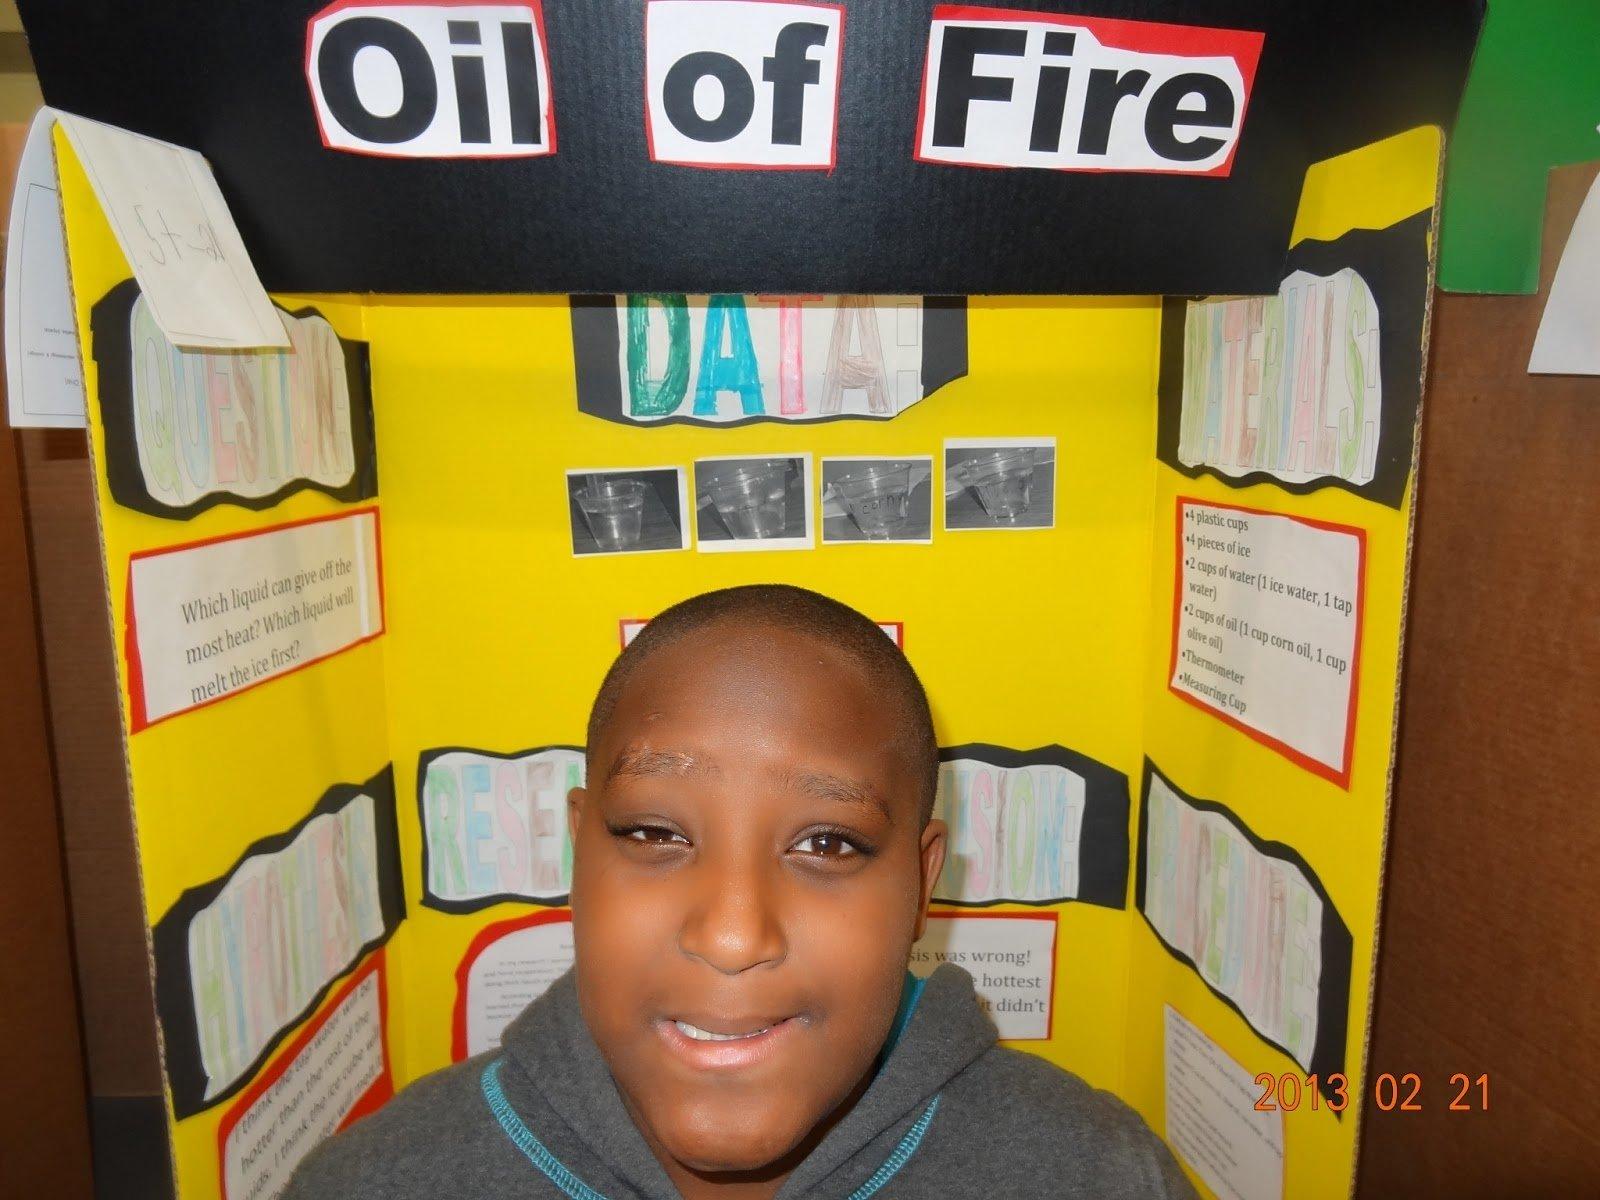 10 Stunning 6 Grade Science Project Ideas nokw woodwork 5th grade 8th grade science fair projects info 10